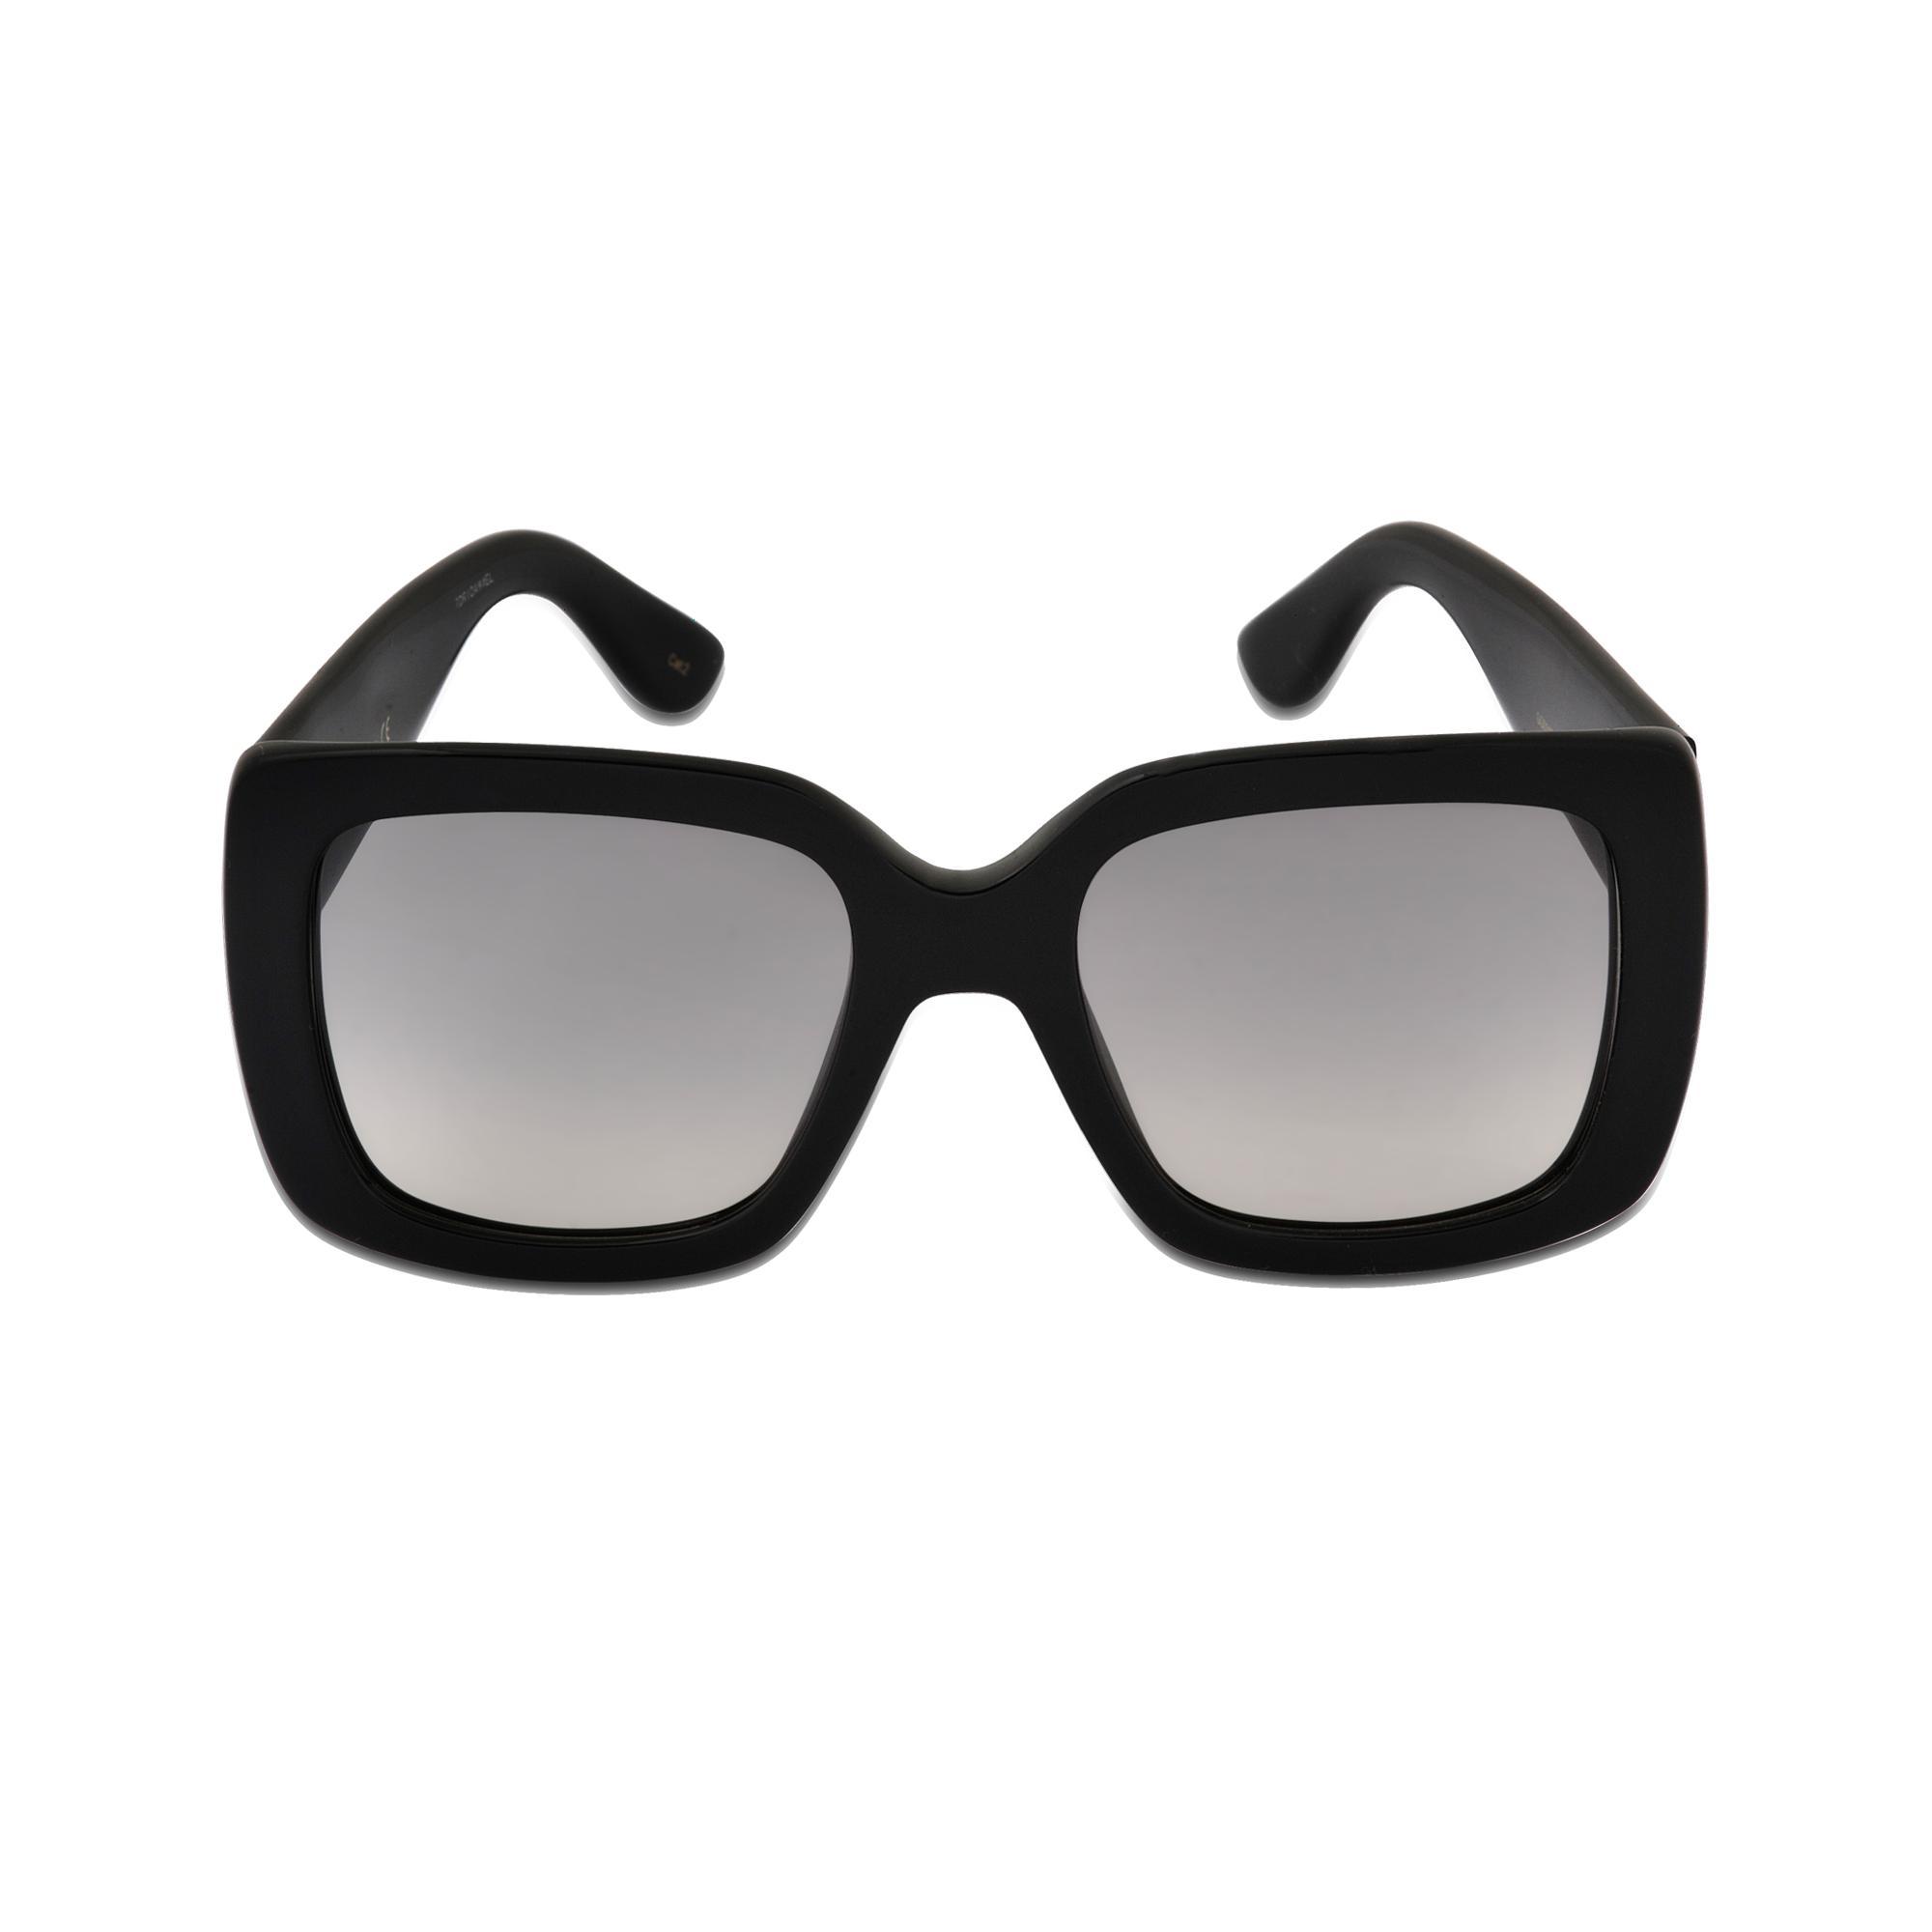 141S Sunglasses Gucci p3PKugE